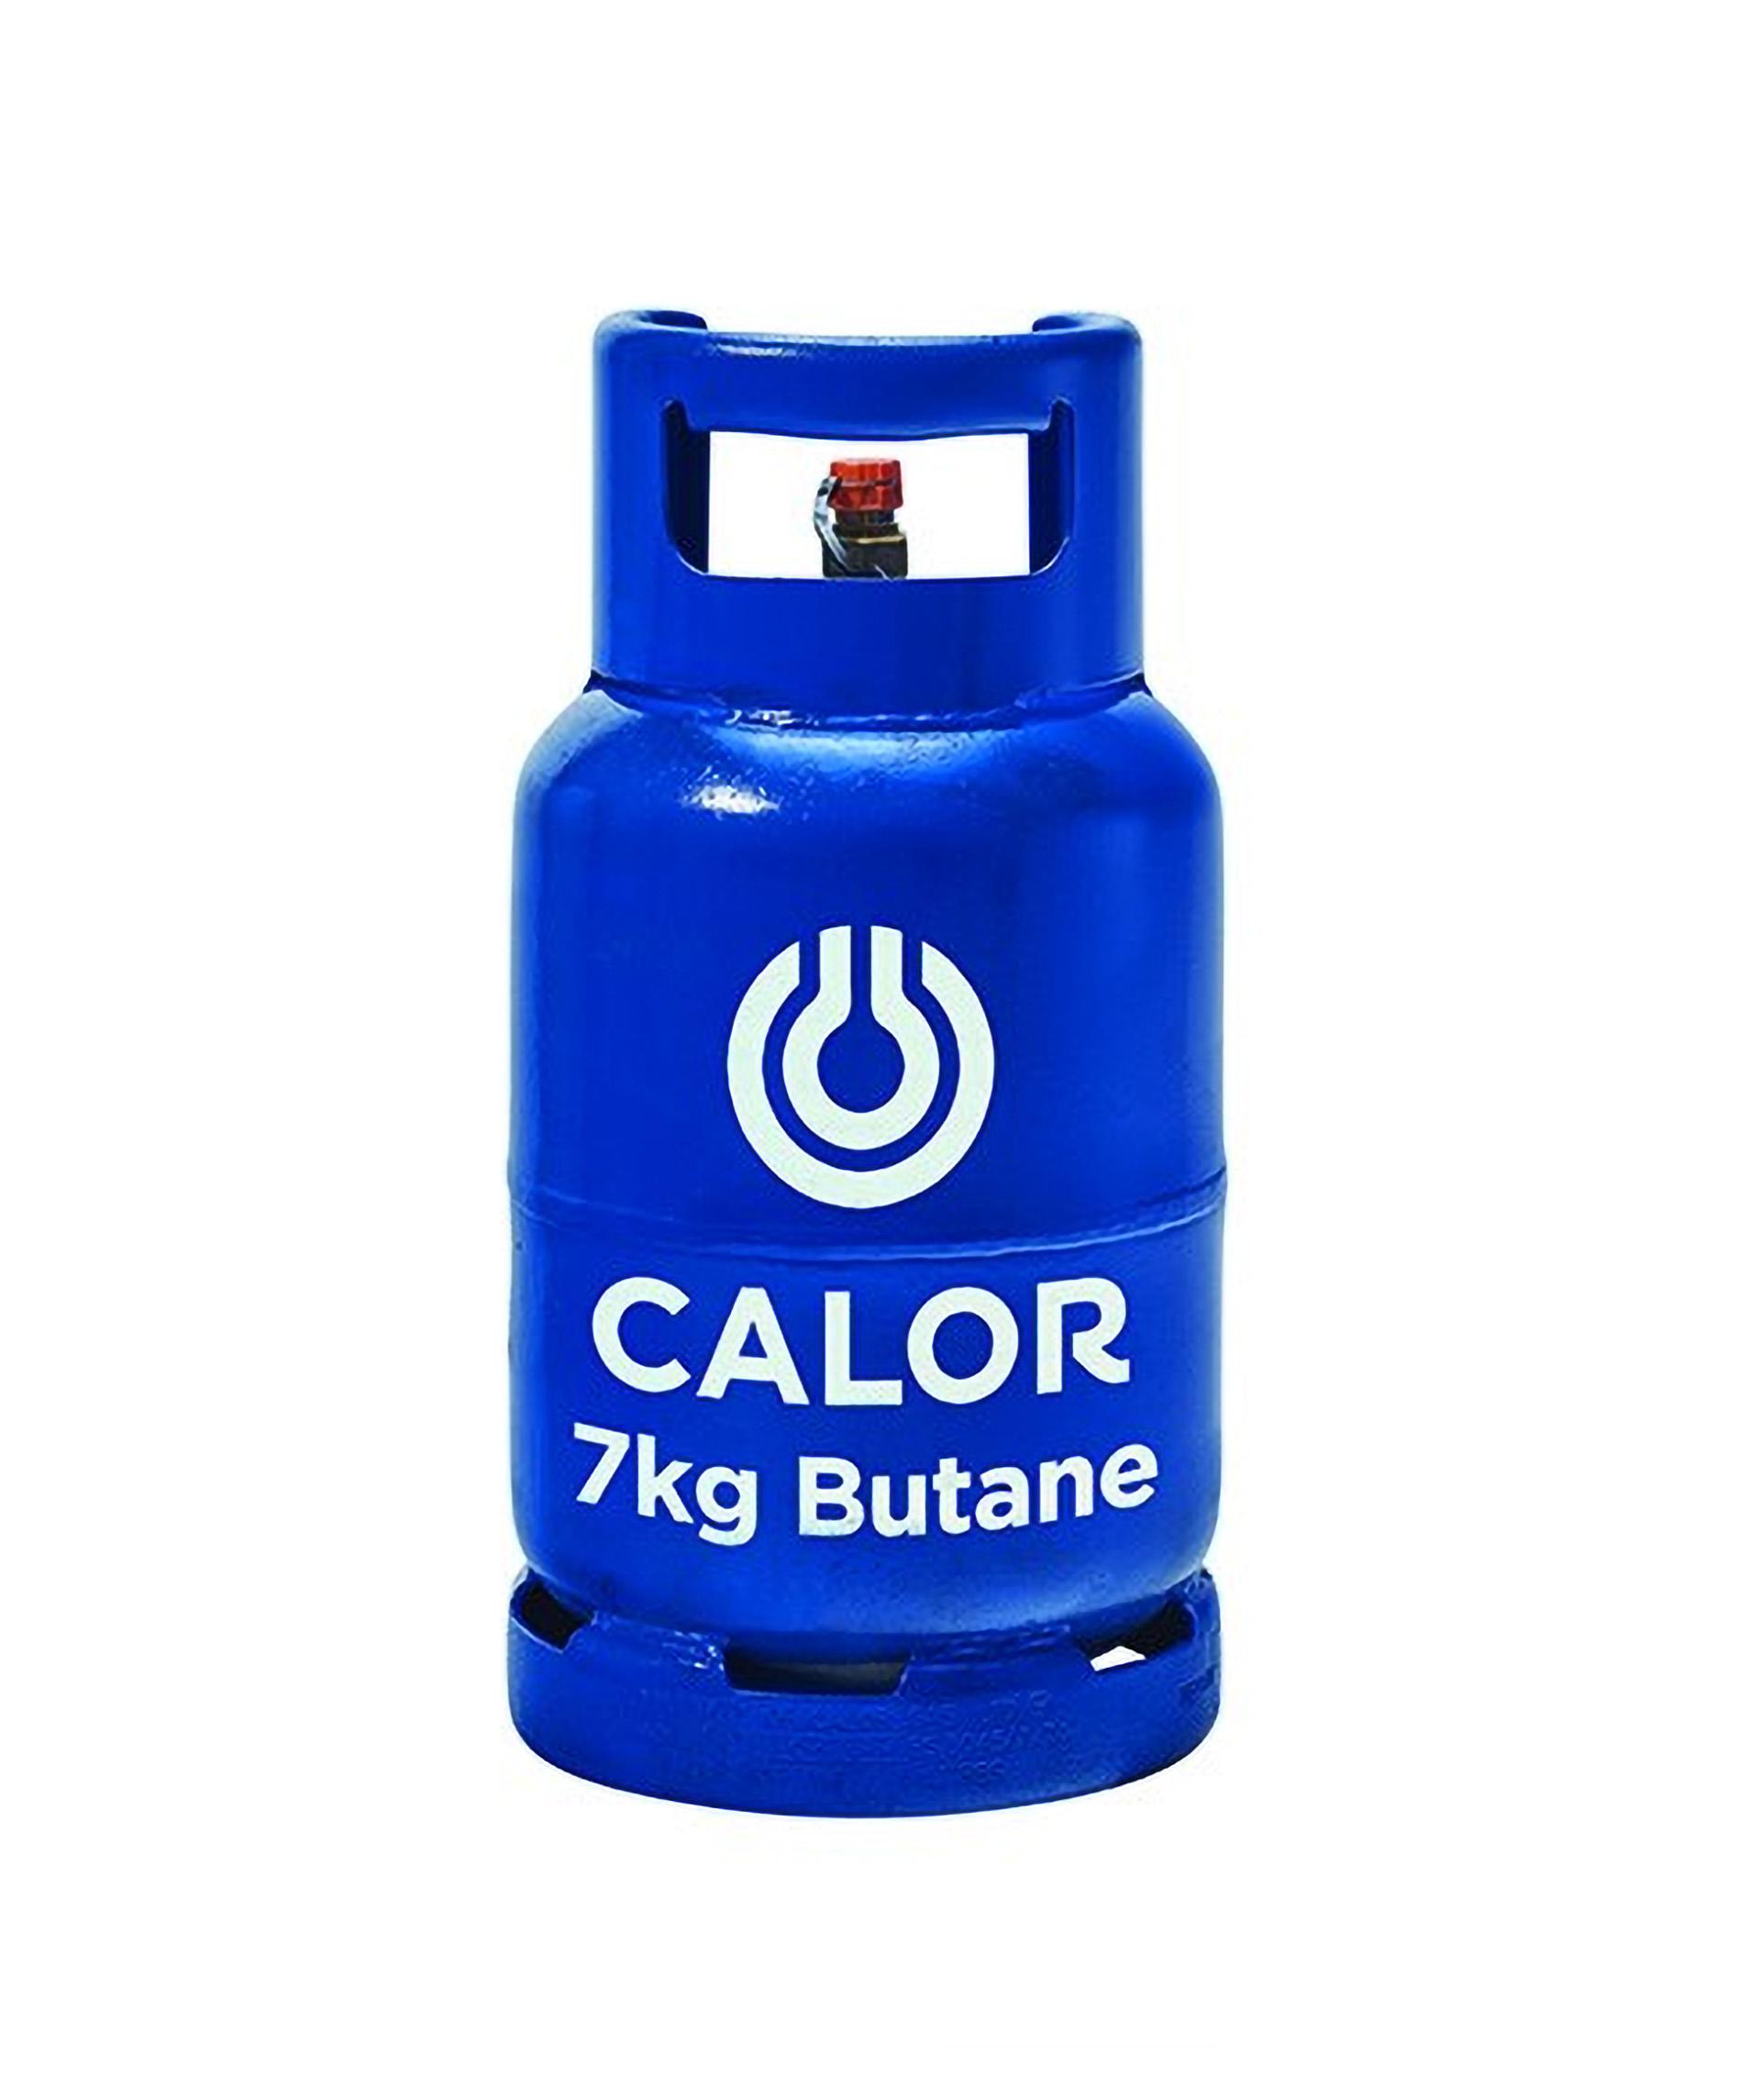 Calor Gas Refill Near Me >> 7kg Butane Calor Gas Bottle